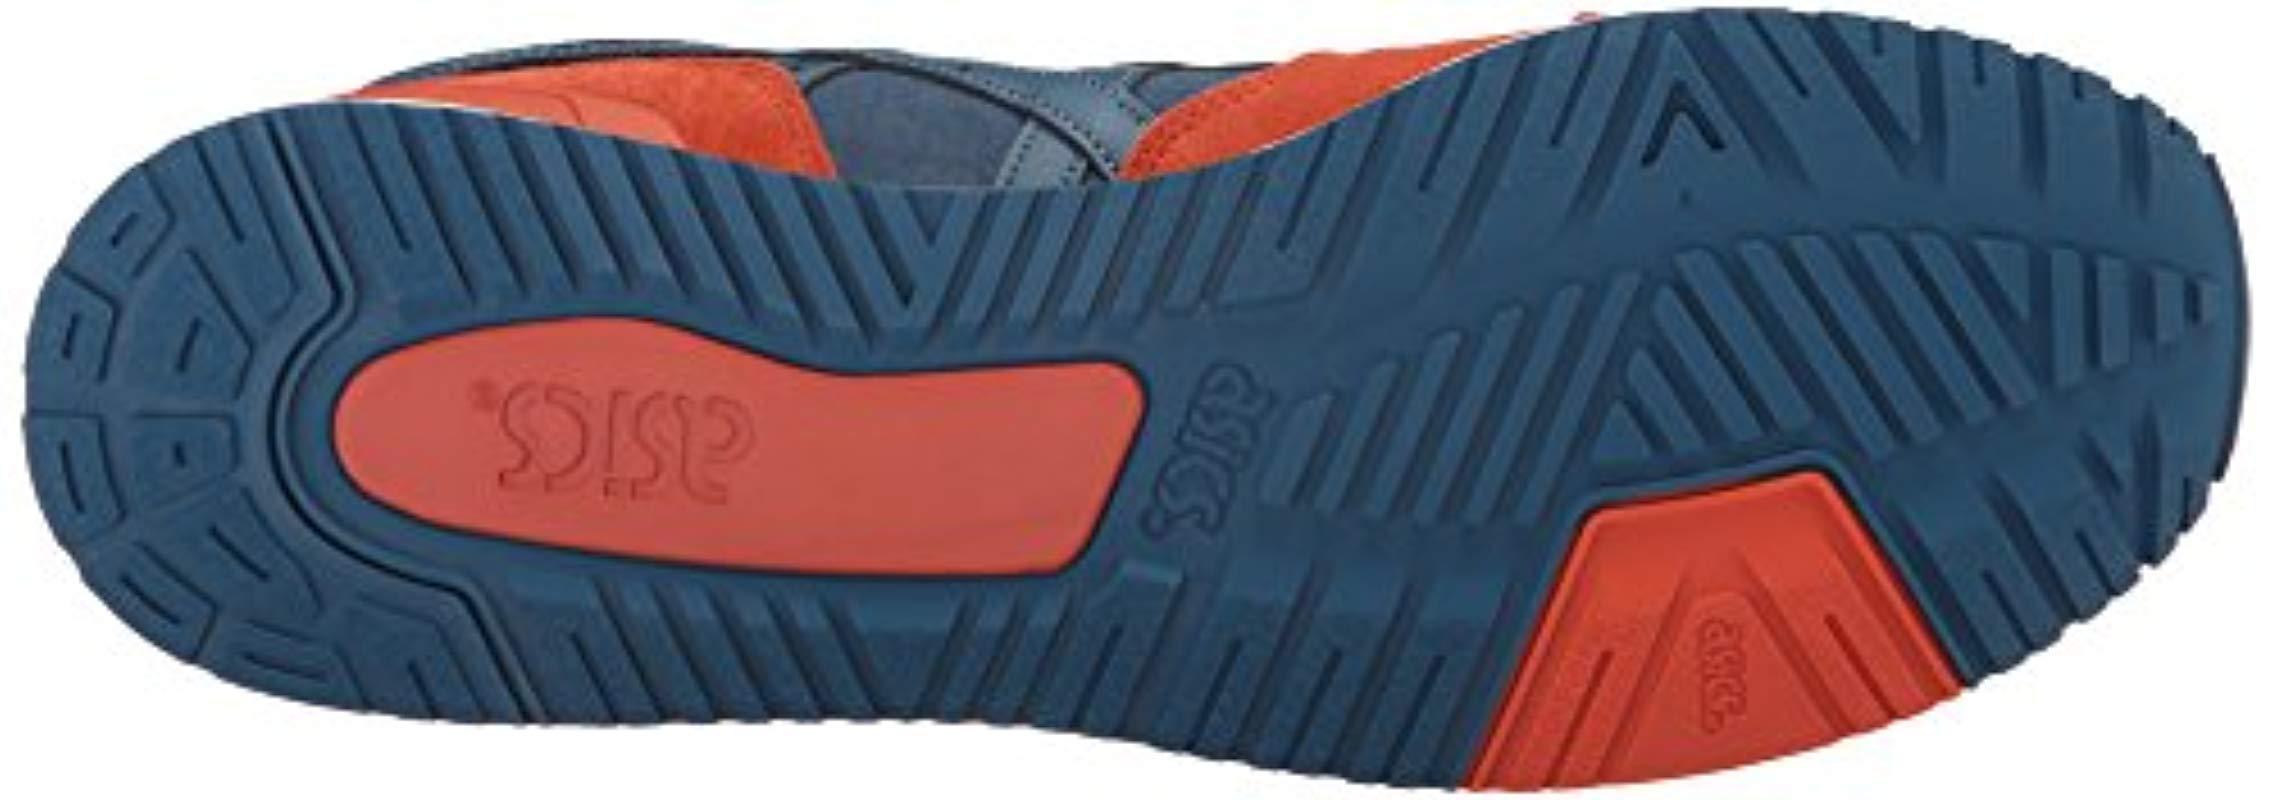 b3bf8be9c6c8 Lyst - Asics Gel-classic Retro Running Sneaker in Blue